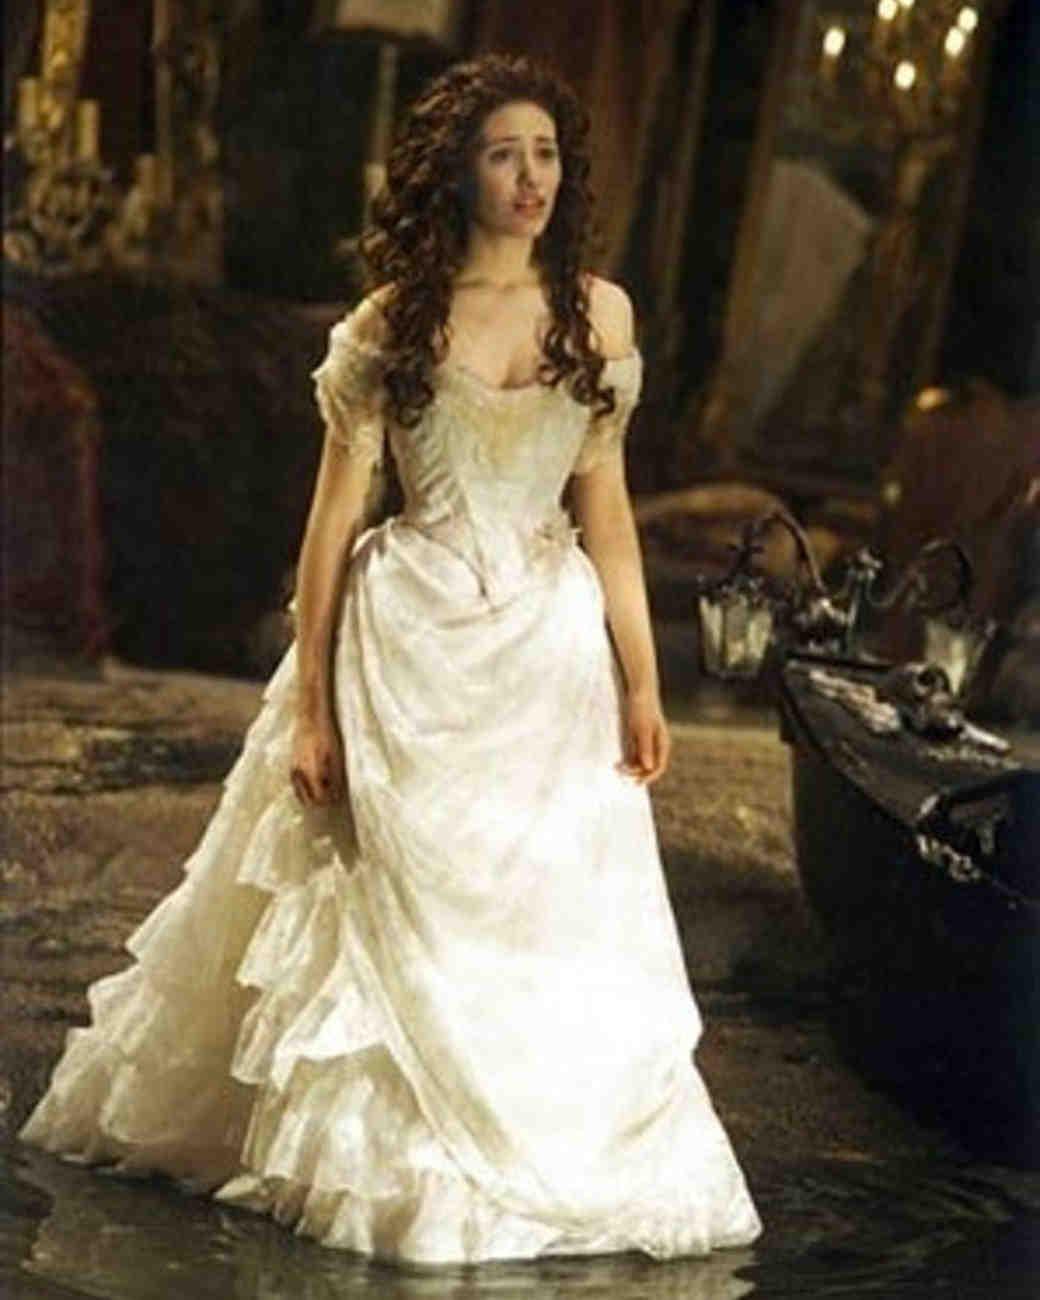 Best Movie Wedding Dresses | Dress images